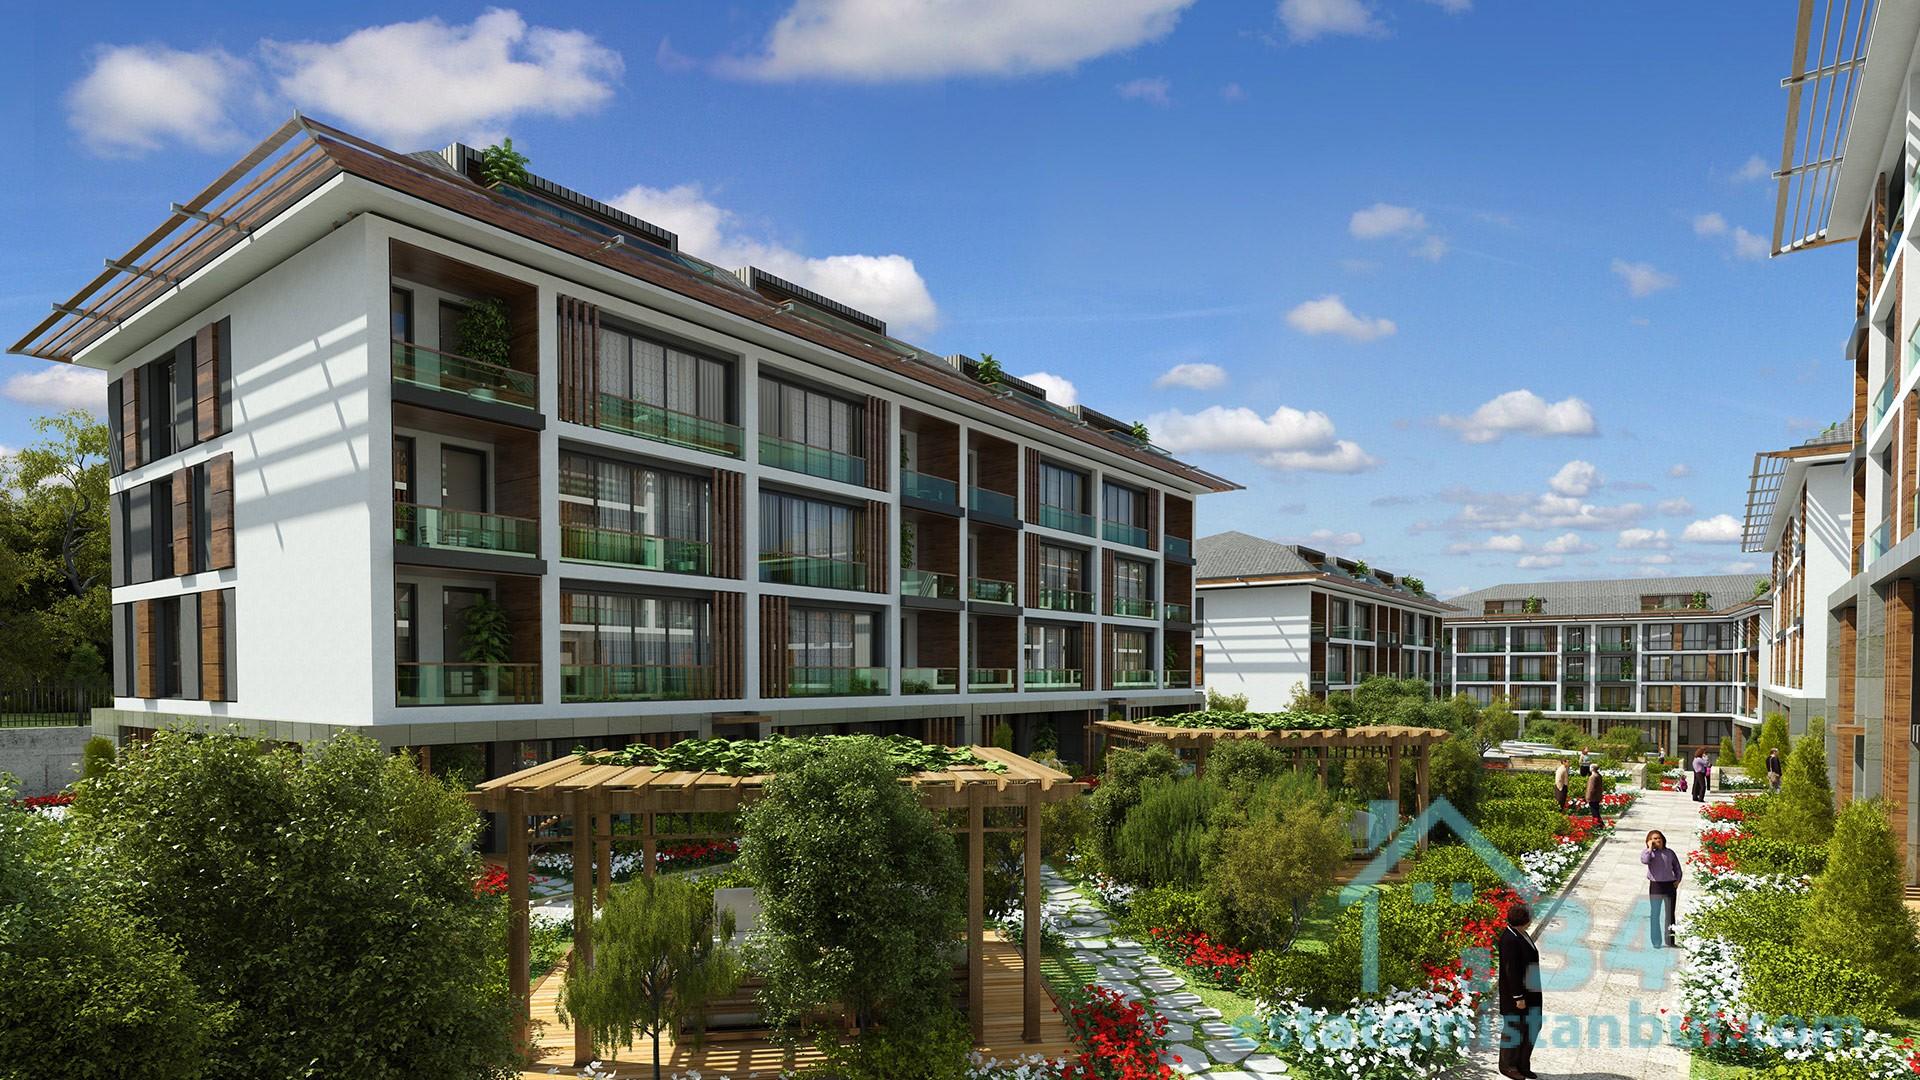 High Quality 6+2 Duplex At The Best Project Of Beylikduzu, Istanbul